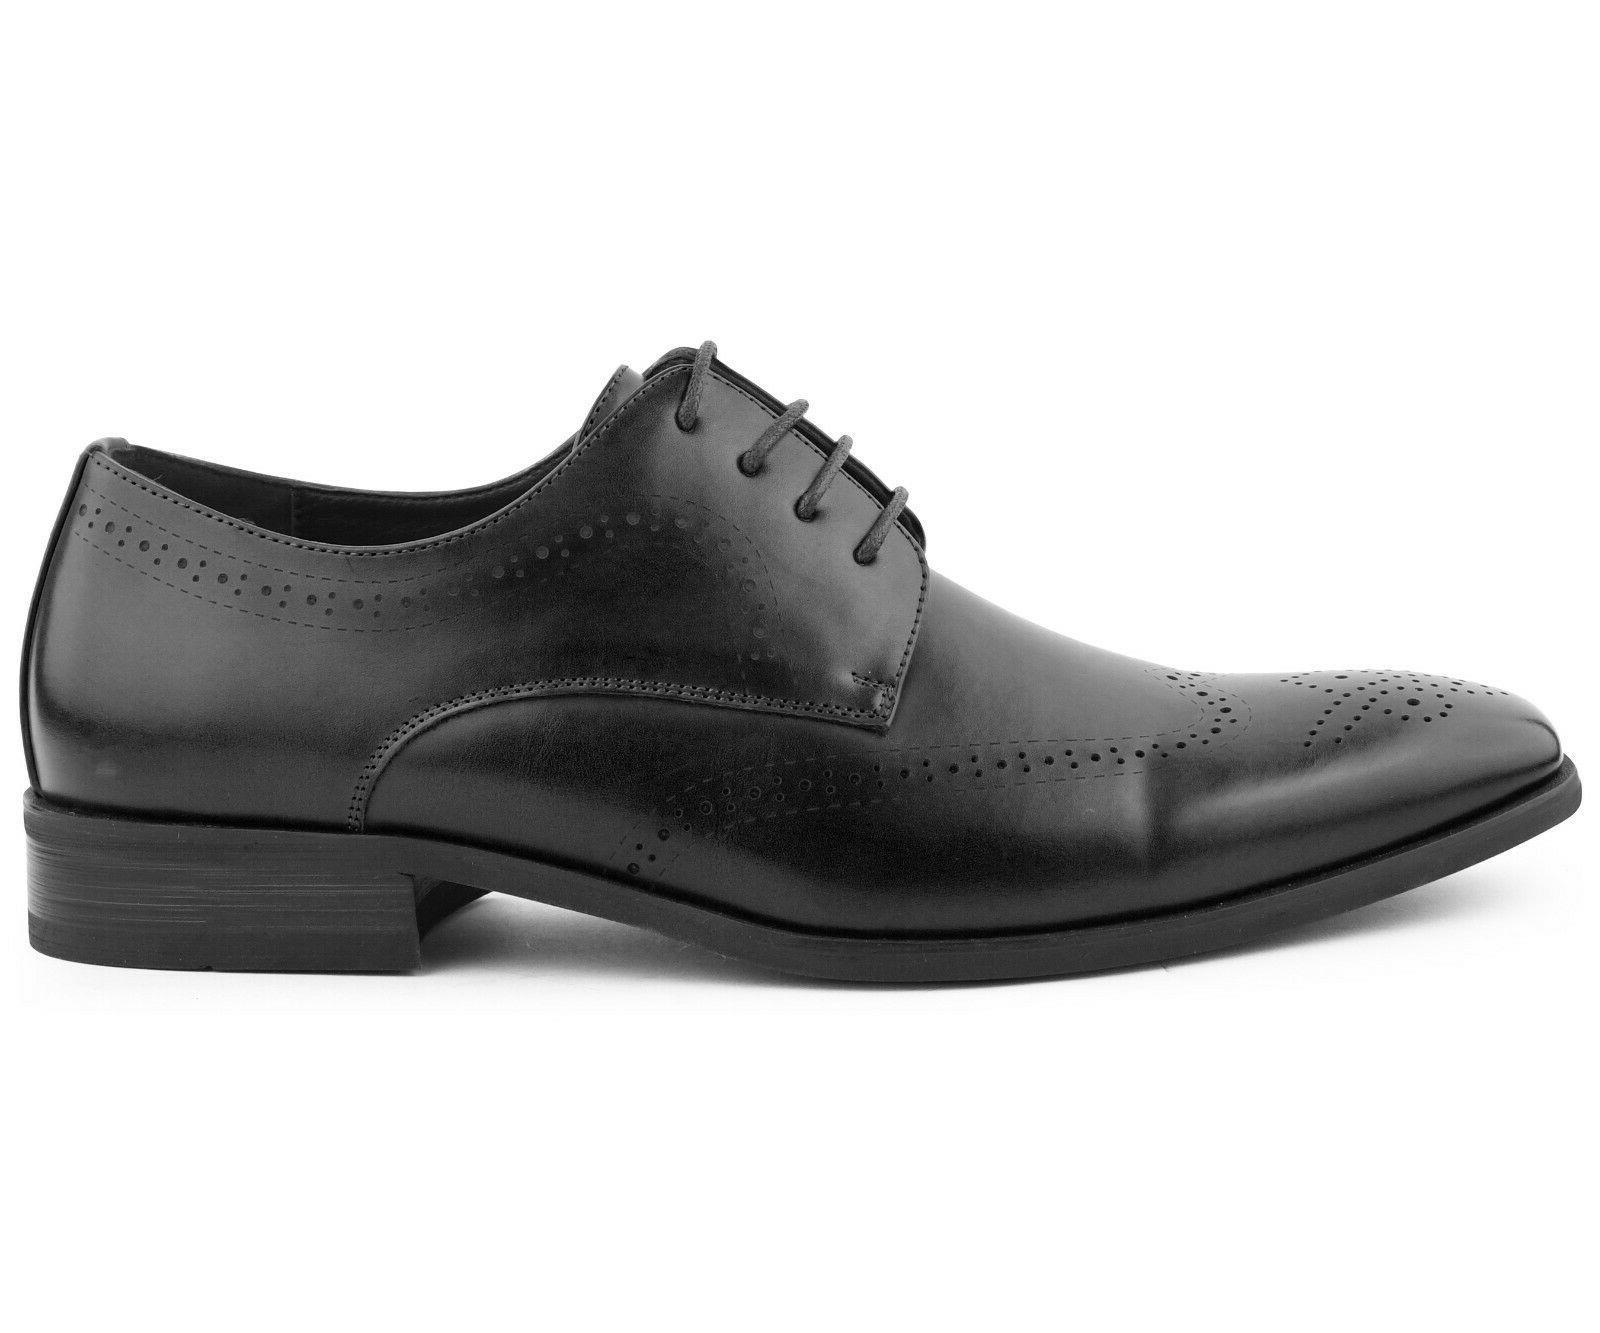 Amali Oxford Dress Shoes